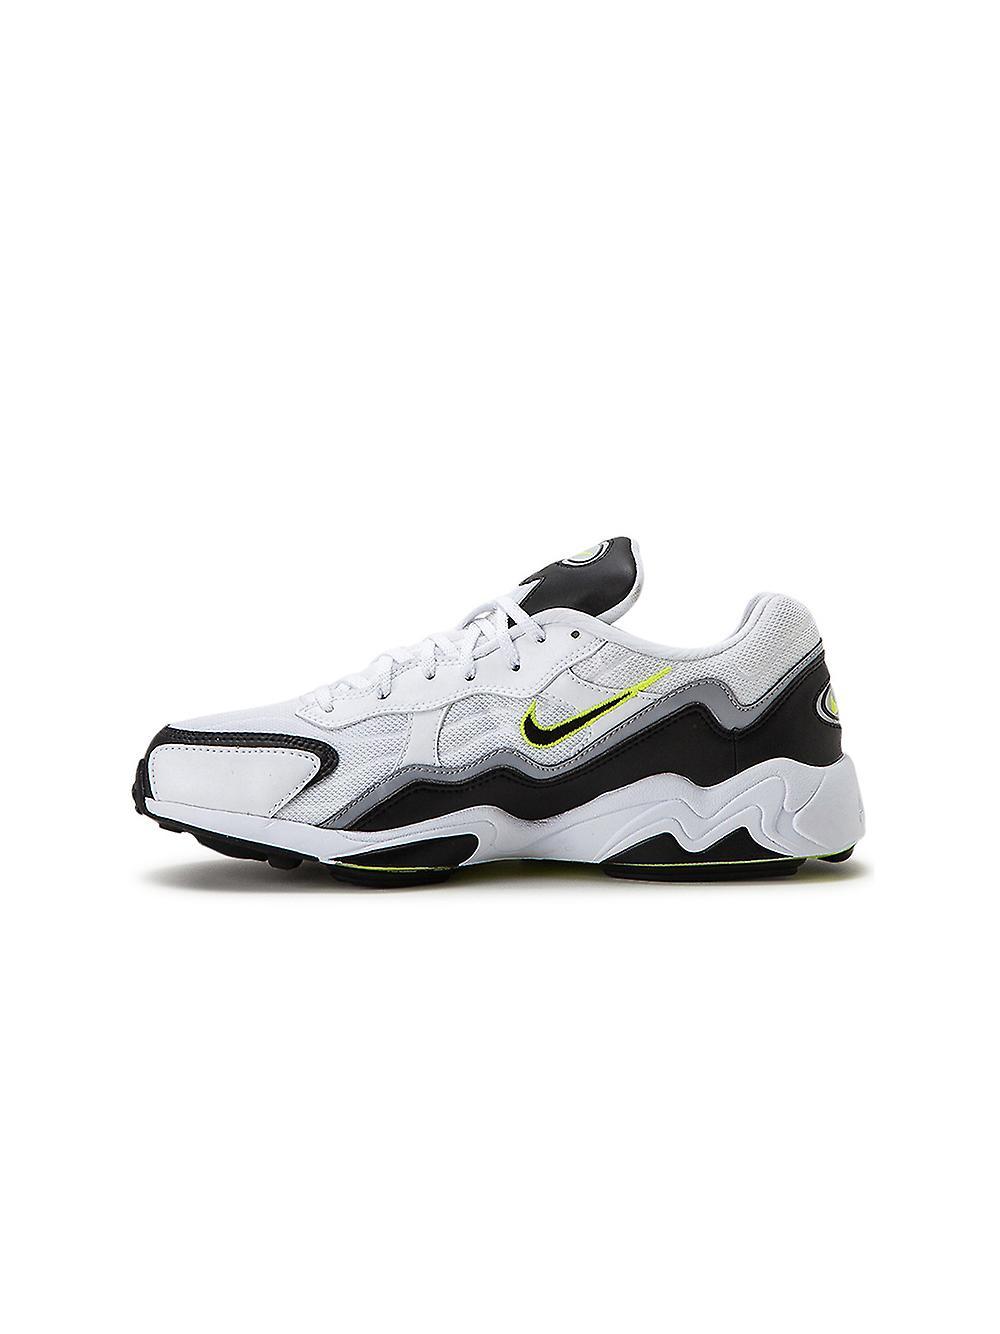 Nike Ezcr004024 Men's White/black Fabric Sneakers